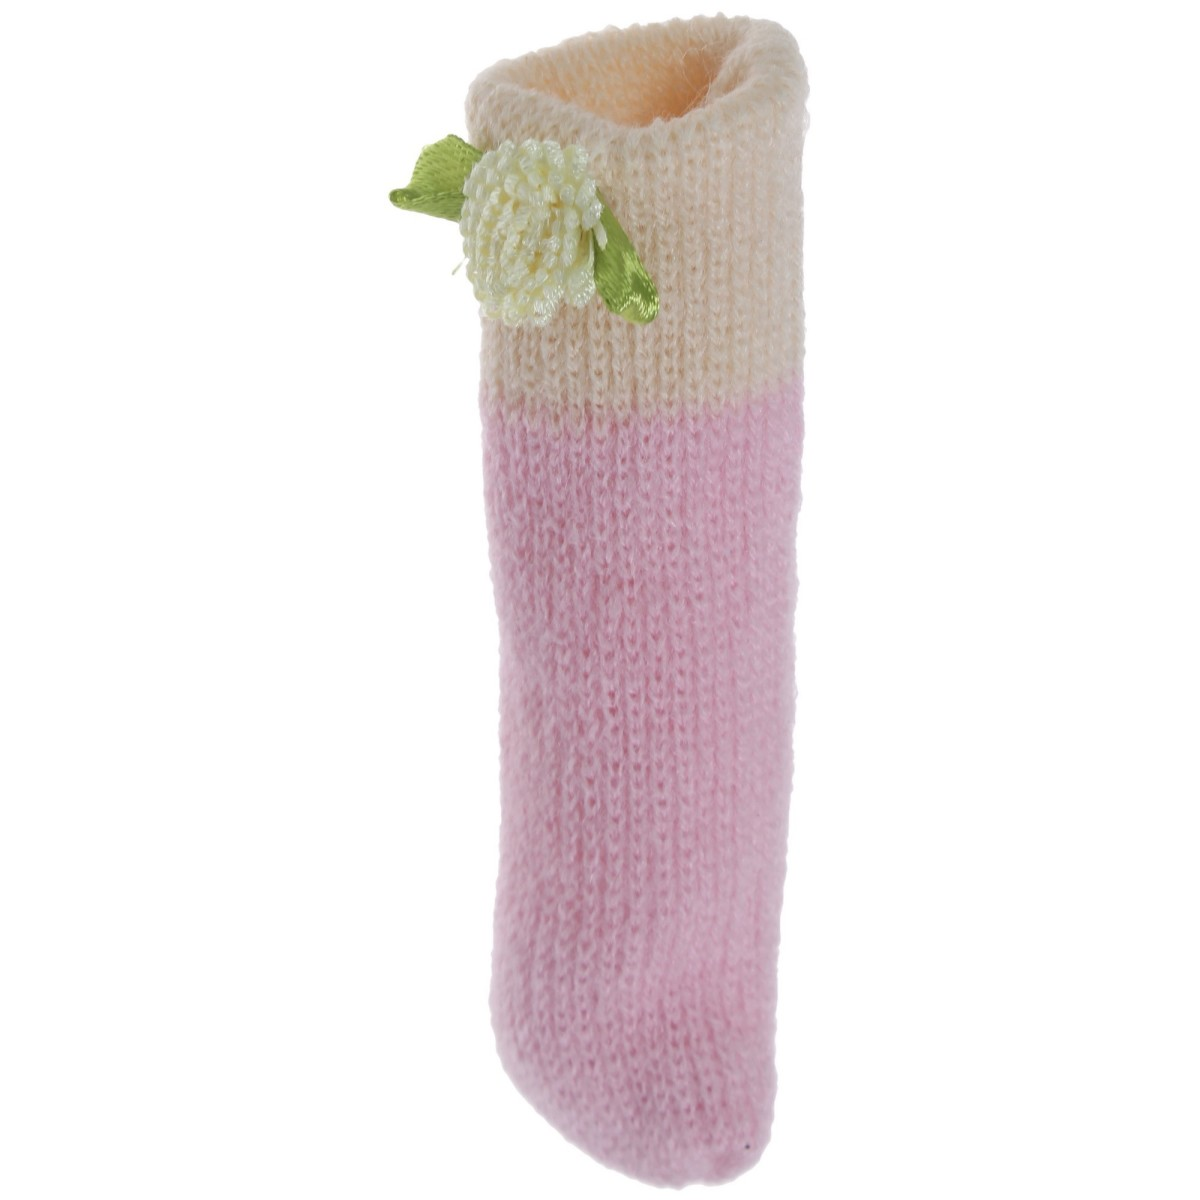 Носки для столов Ростерм S3 4 шт.